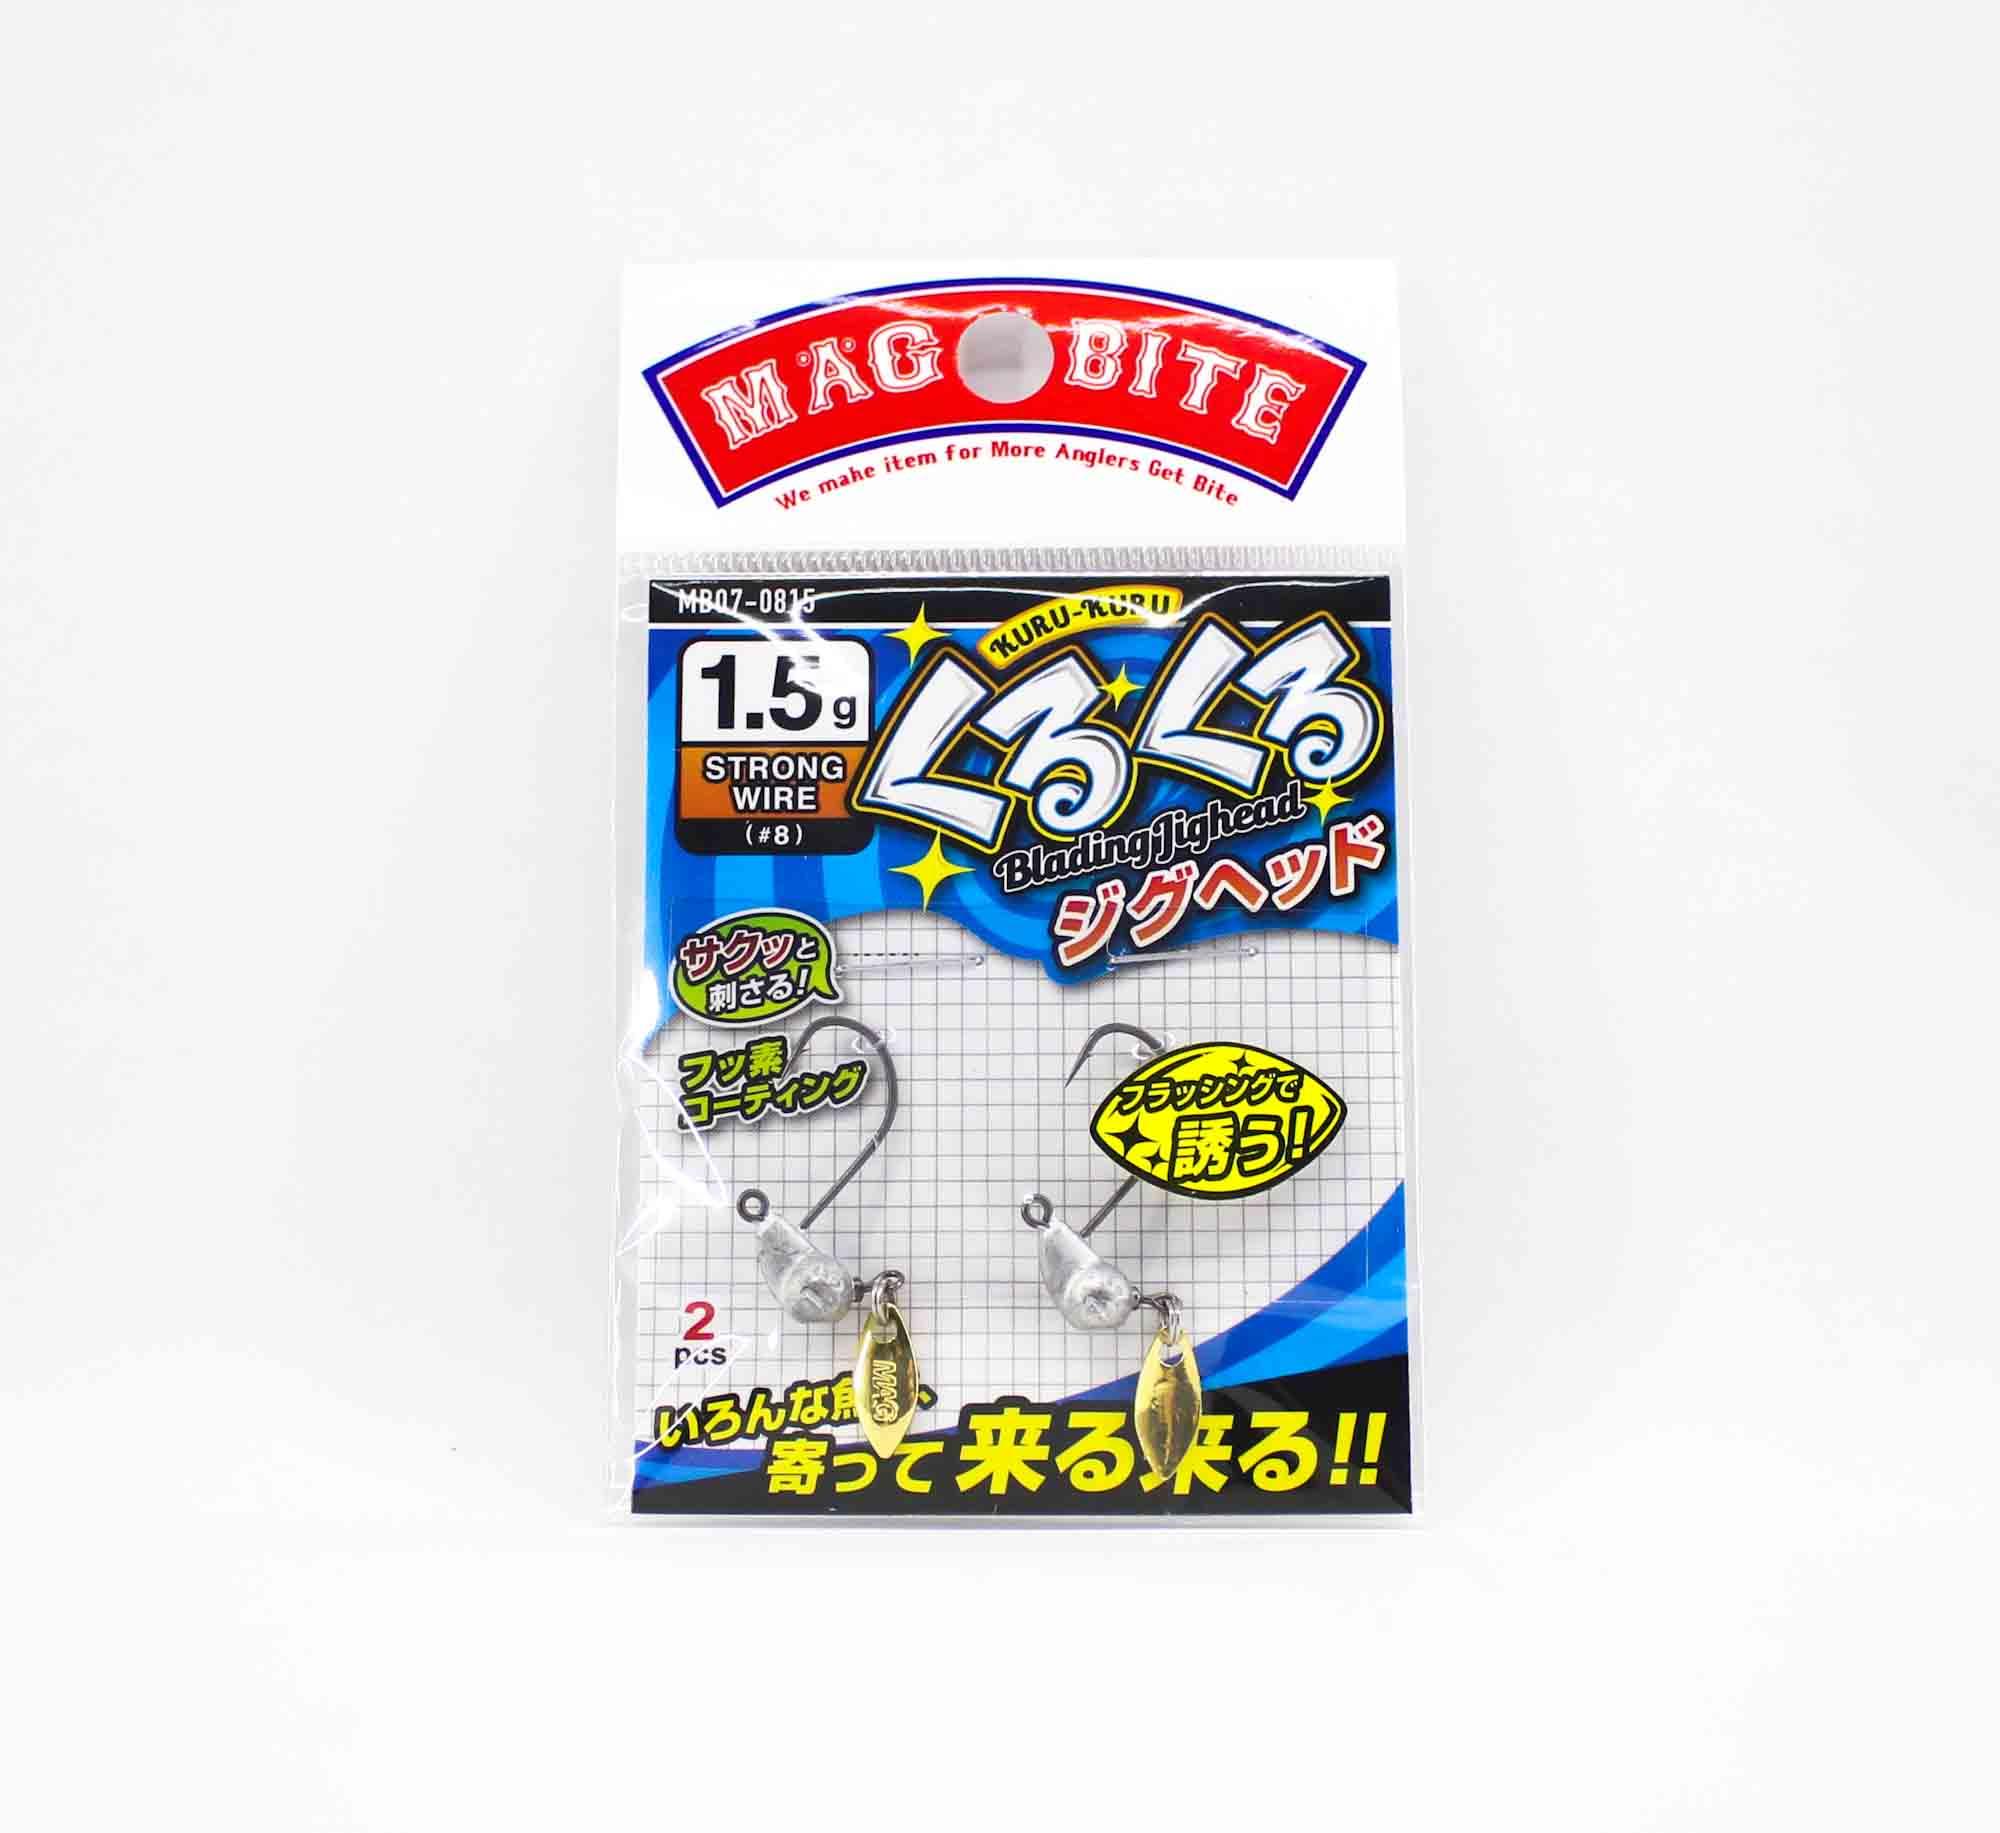 Harimitsu Mag bite Jighead KuruKuru Blading 1.5 grams size 8 (7048)